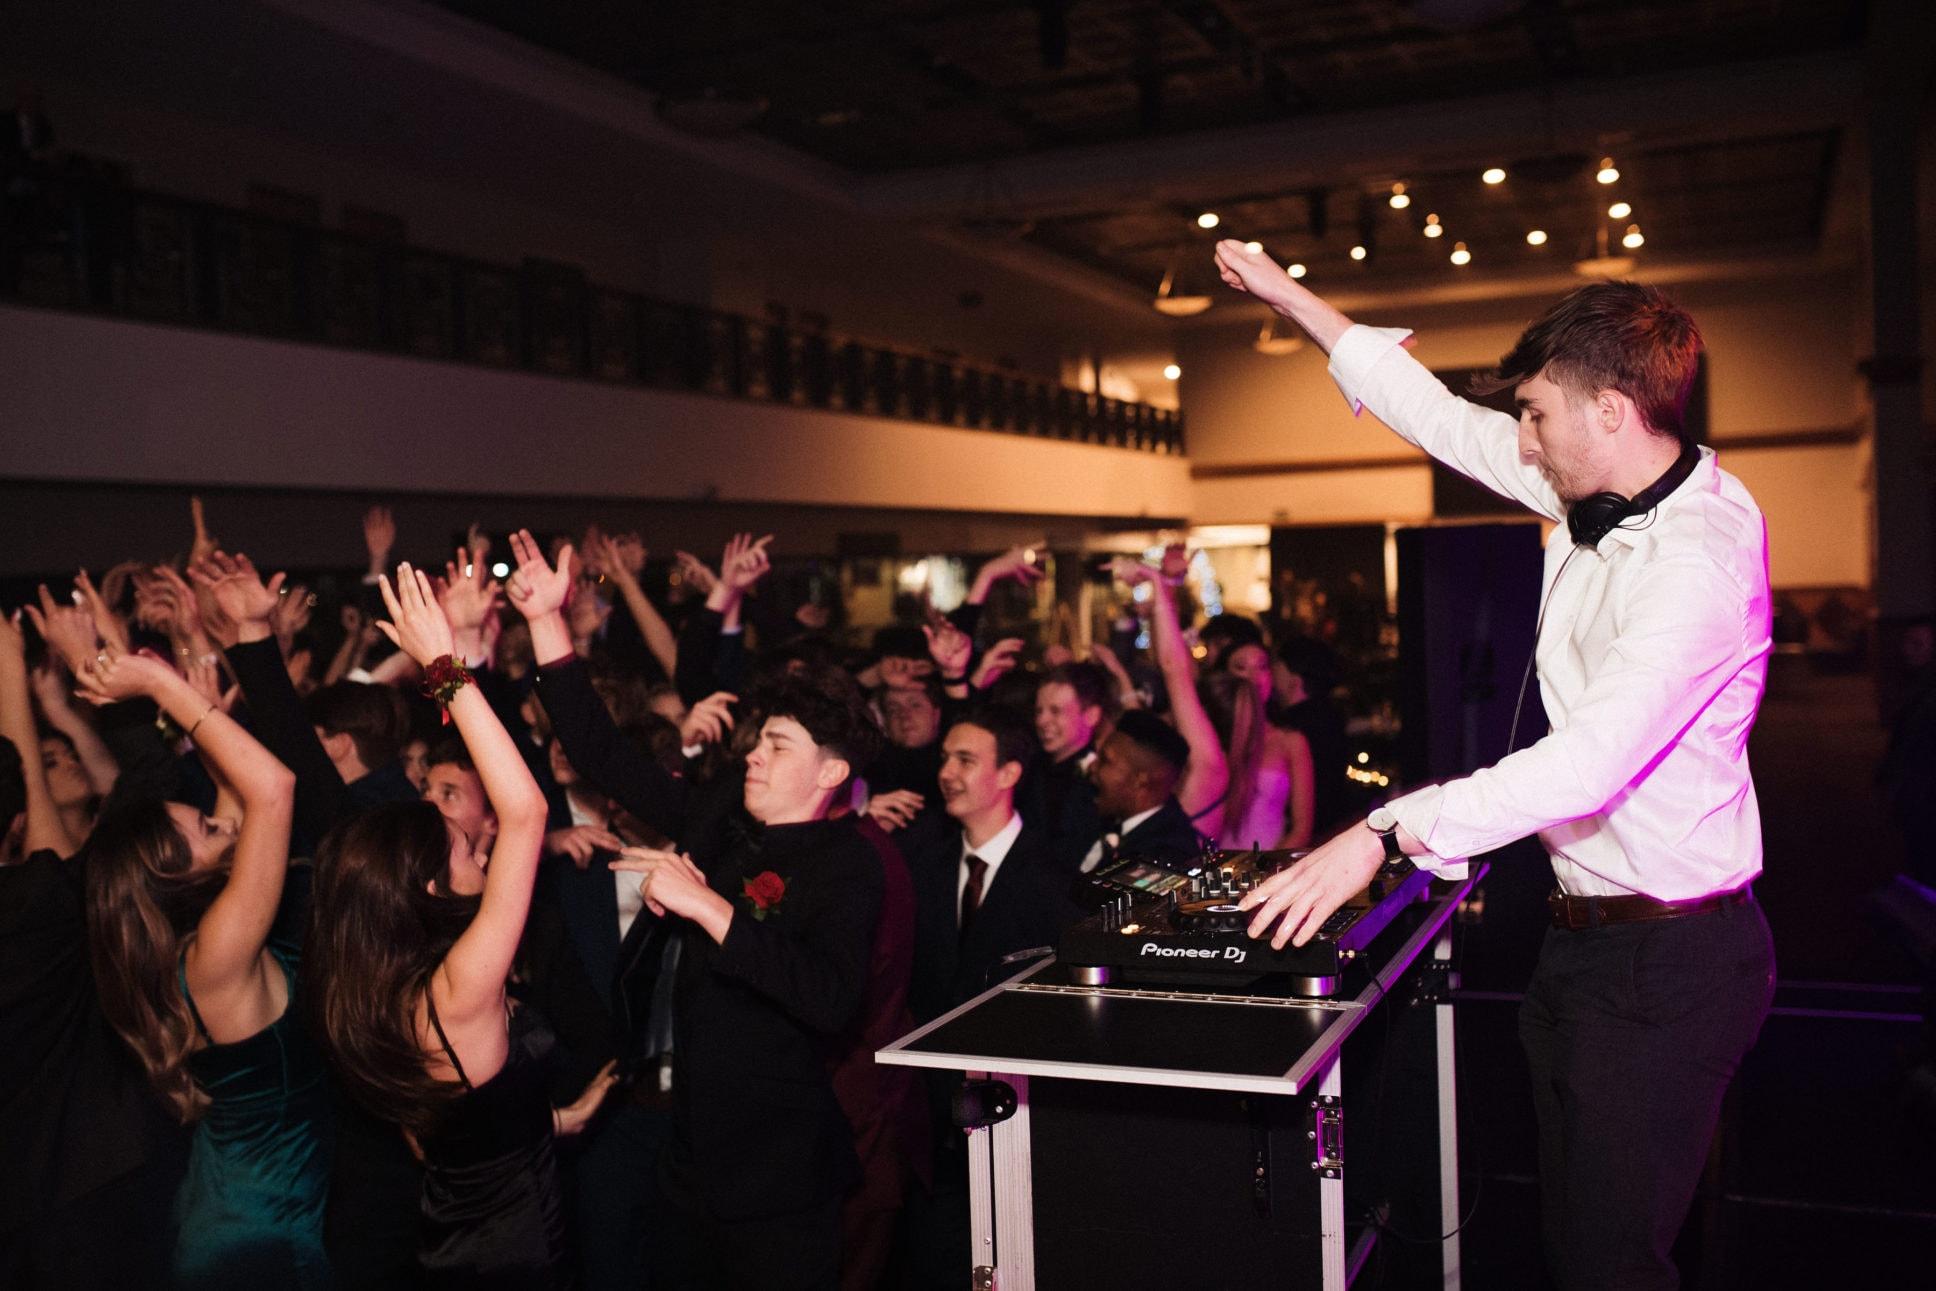 Dj inspo at school ball in Auckland.